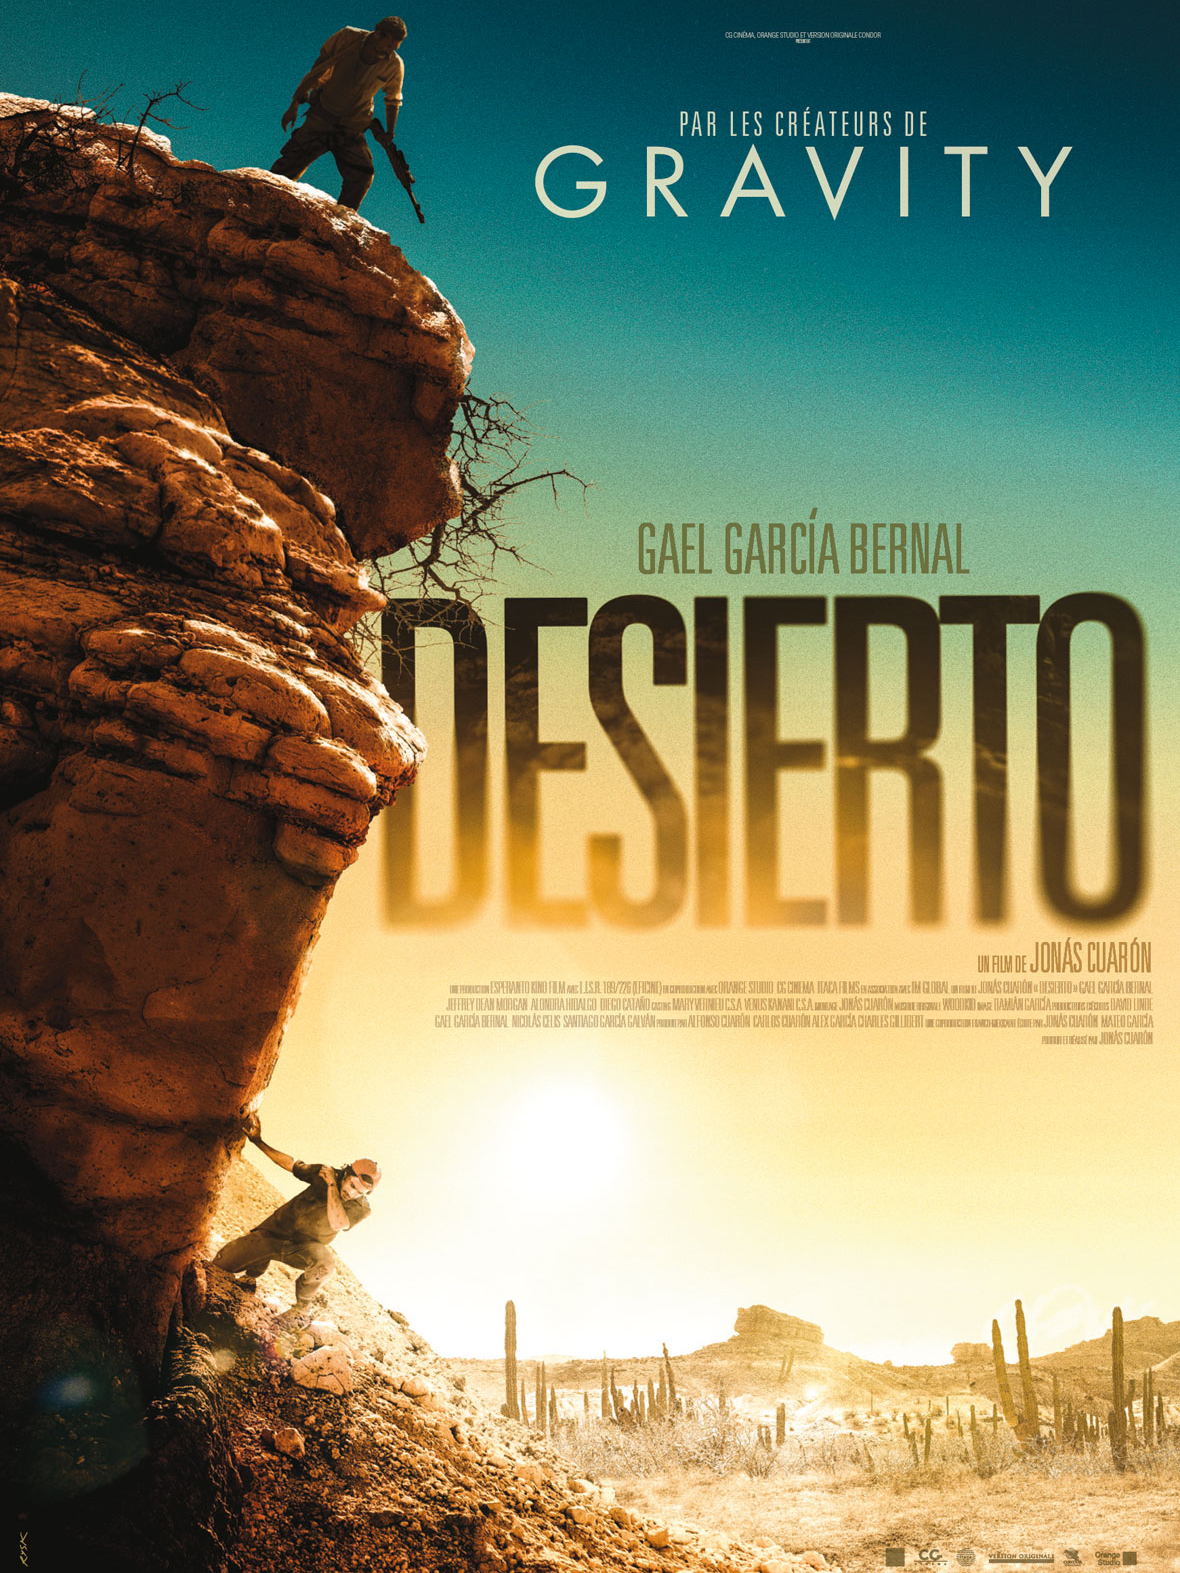 Desierto | Cuarón, Jonás (Réalisateur)